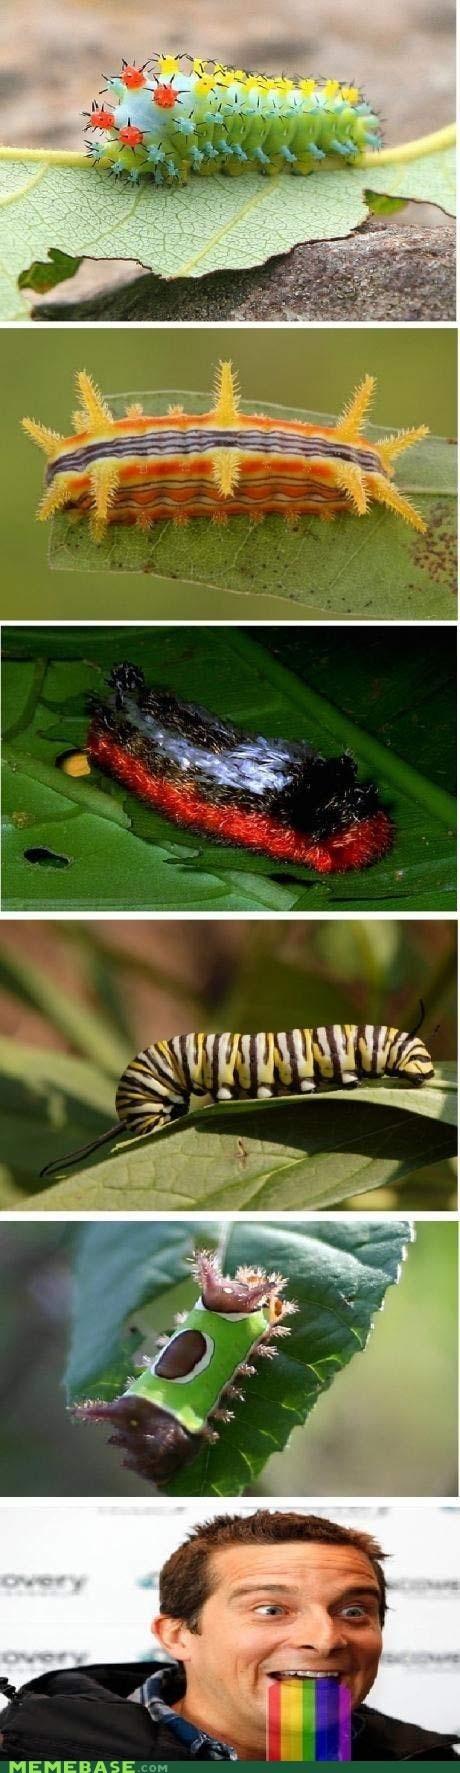 bear grylls bugs caterpillar mouth rainbow - 6132790784